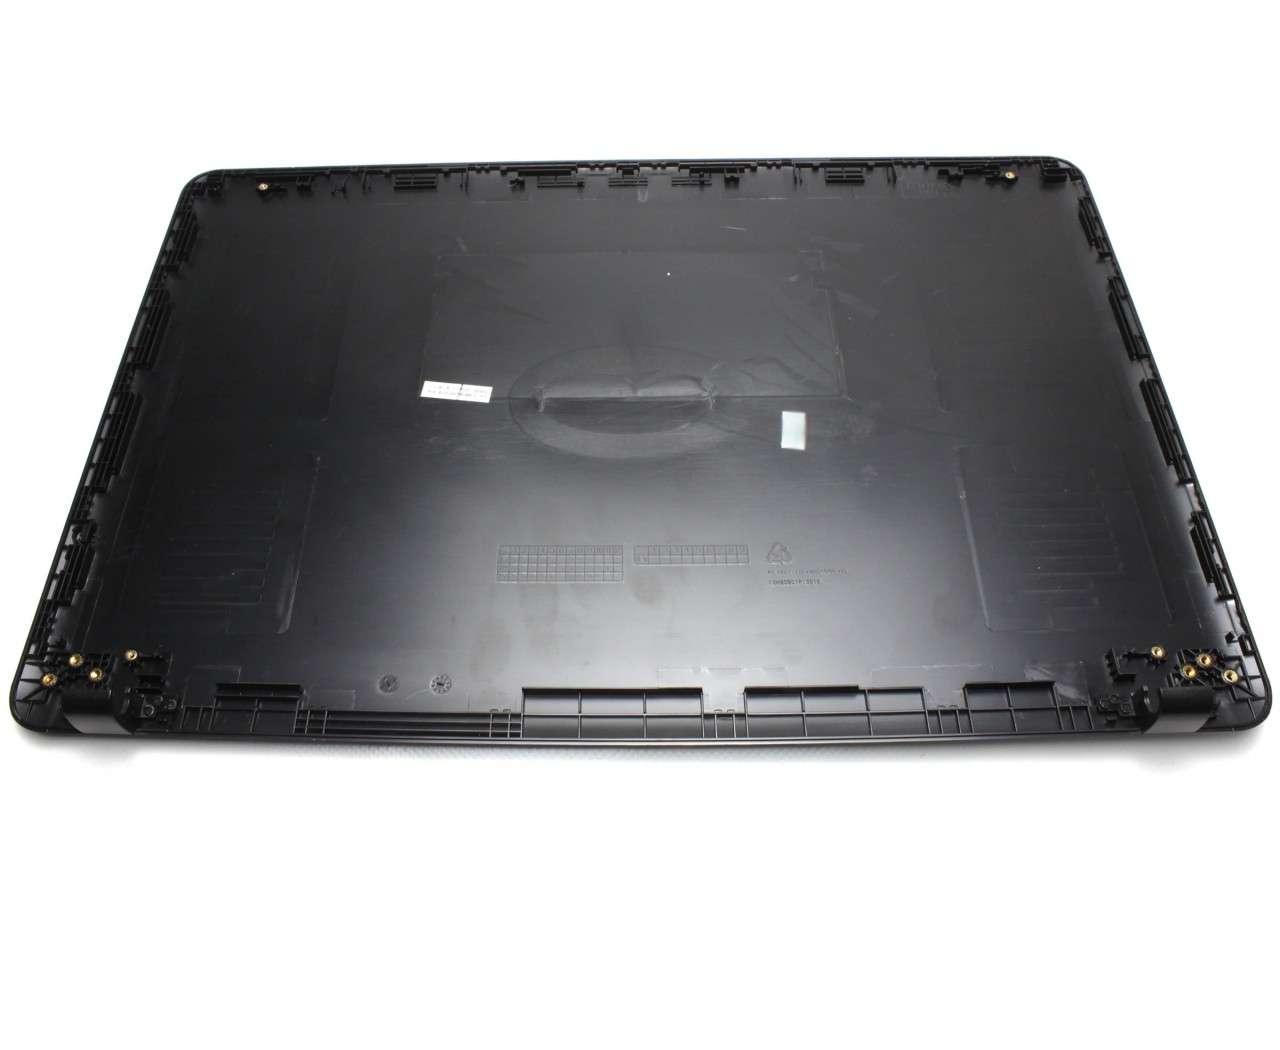 Capac Display BackCover Asus 90NB0B31 R7A010 Carcasa Display Neagra imagine